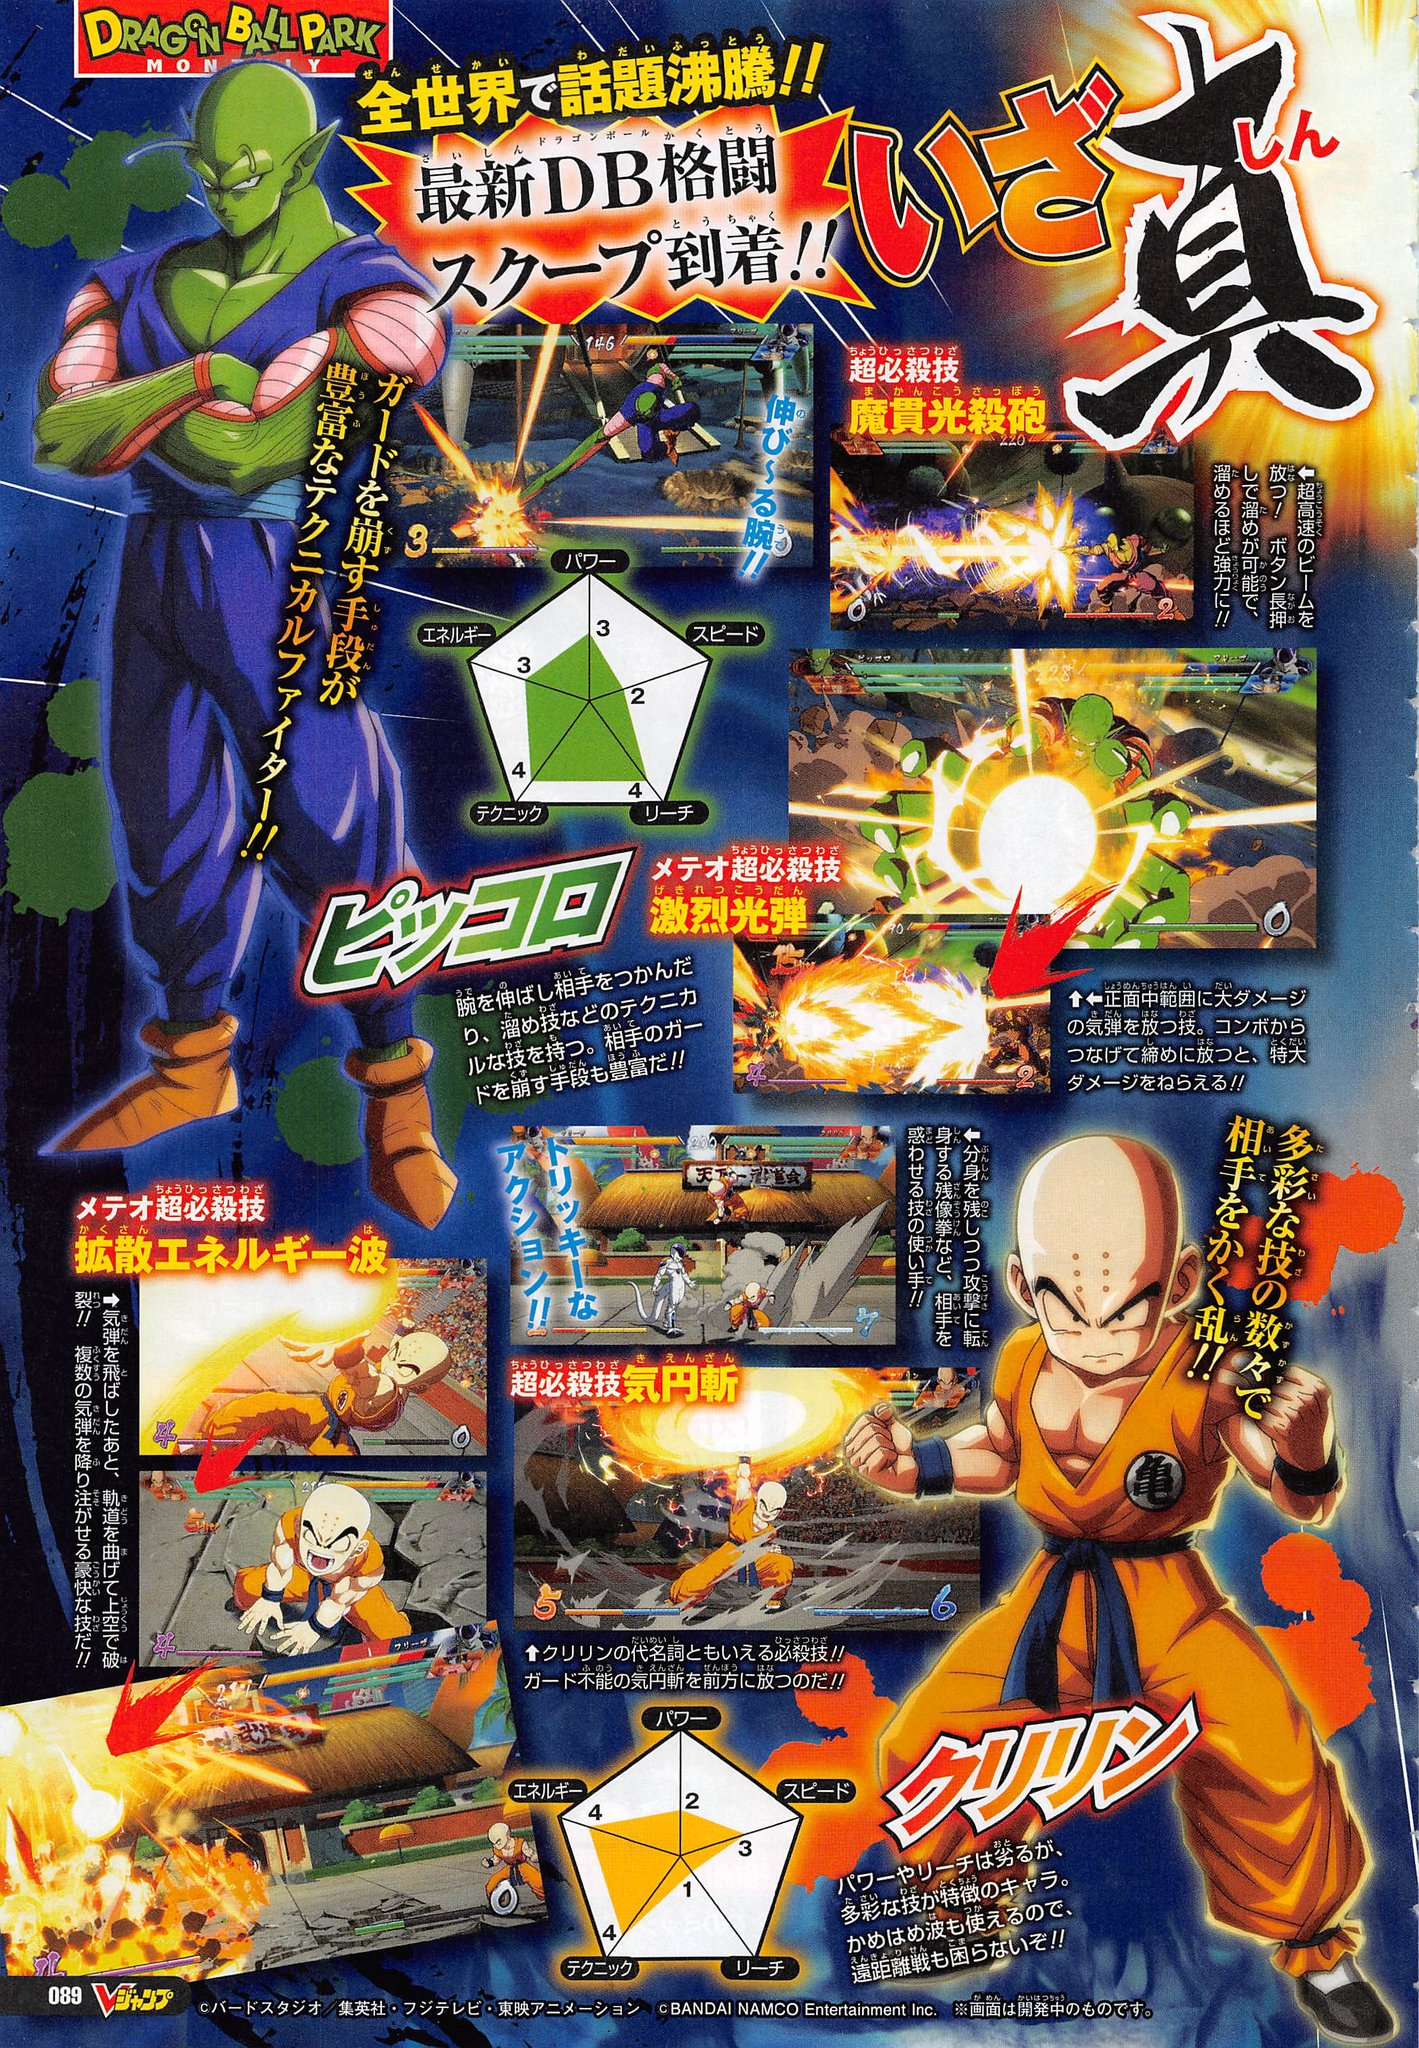 Dragon-Ball-FighterZ-V-Jump_07-18-17.jpg